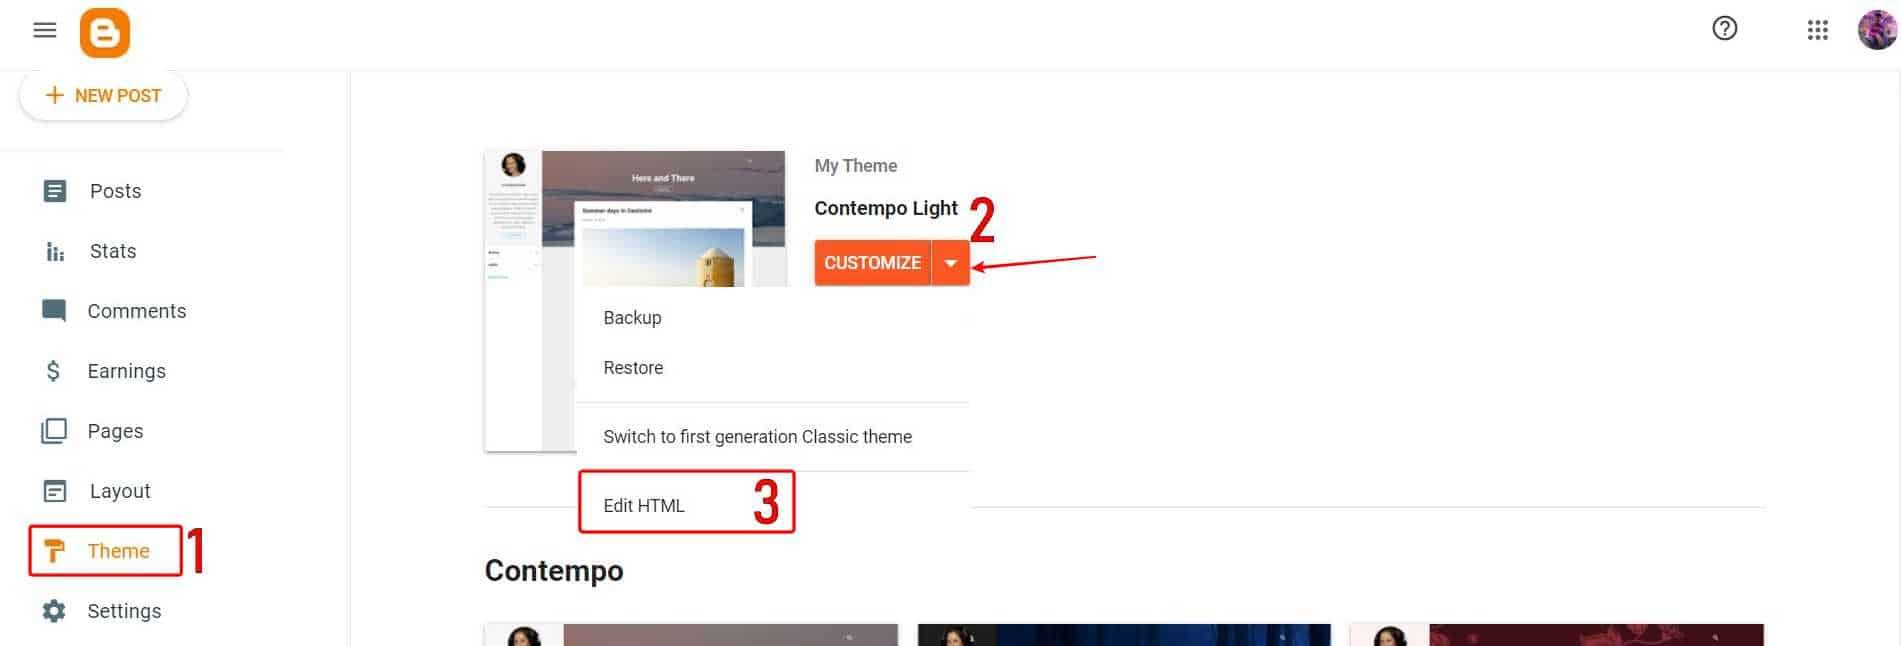 Theme > Edit HTML